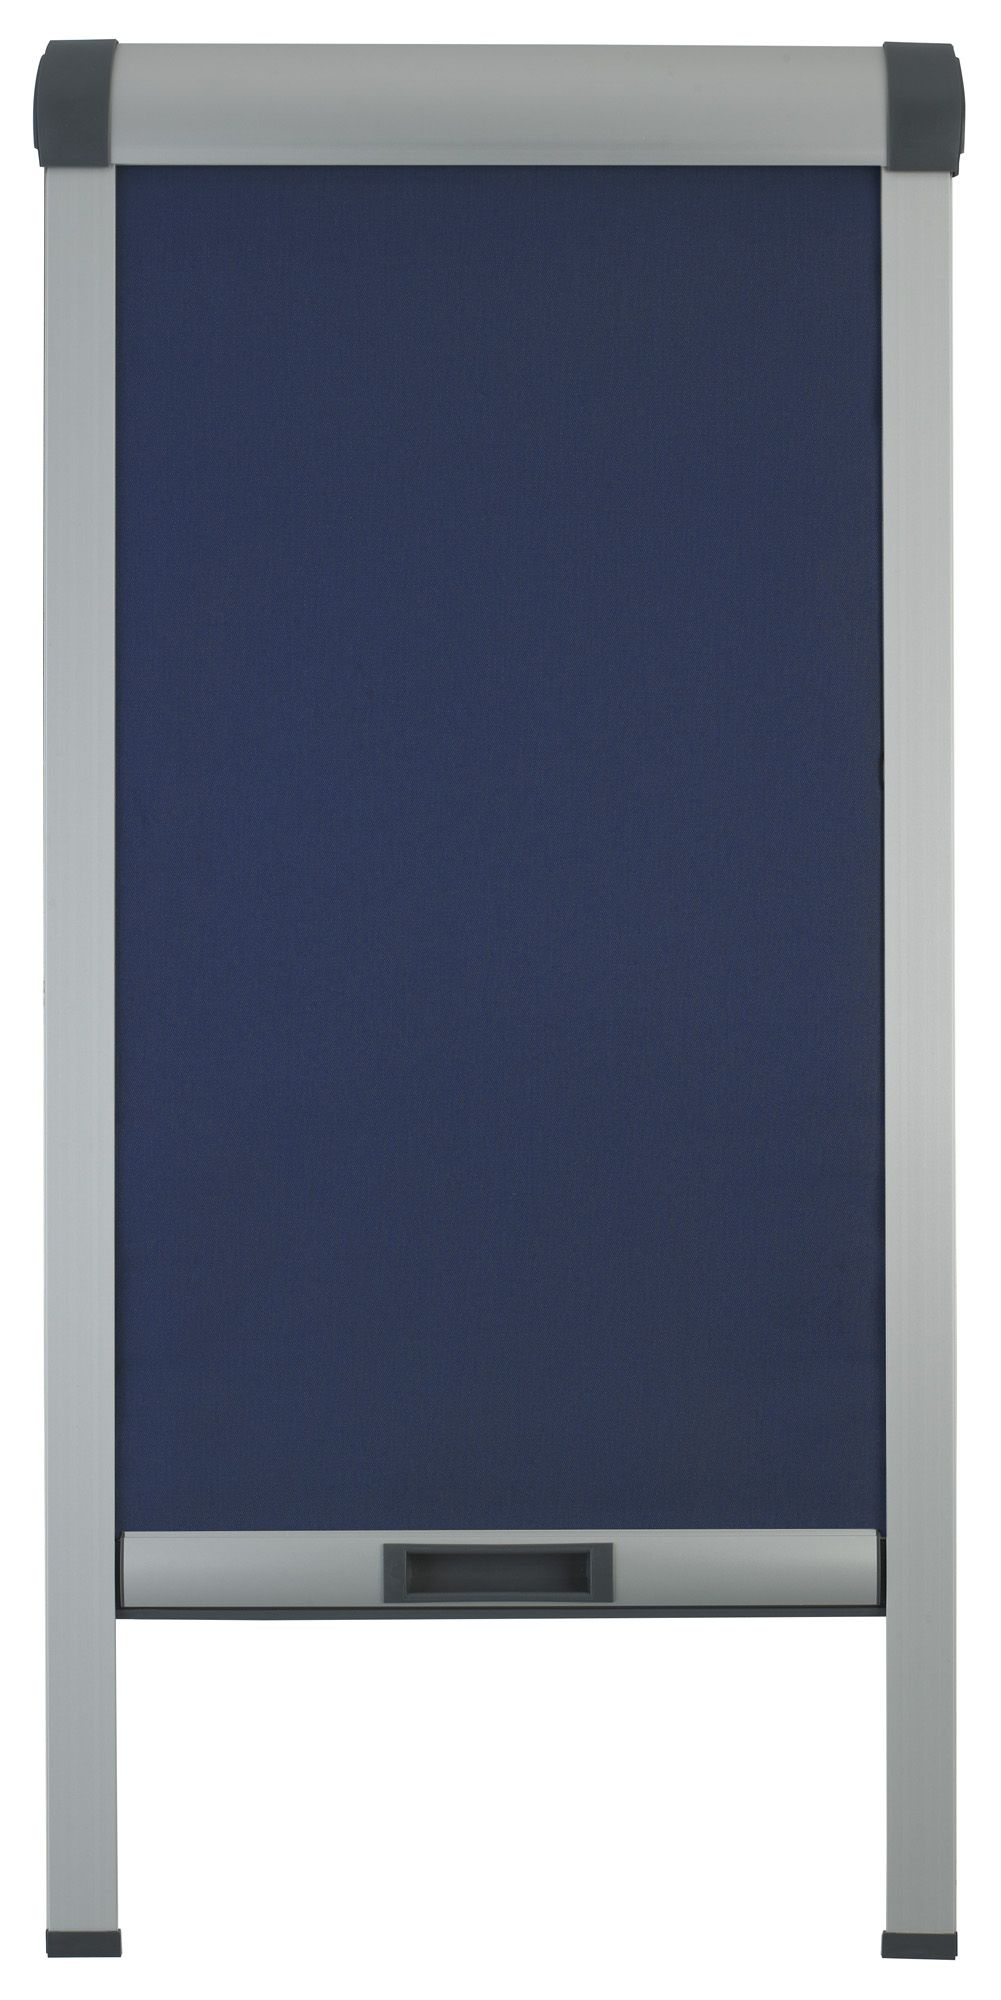 Geom Blue Roof Window Blind H 780mm W 540mm